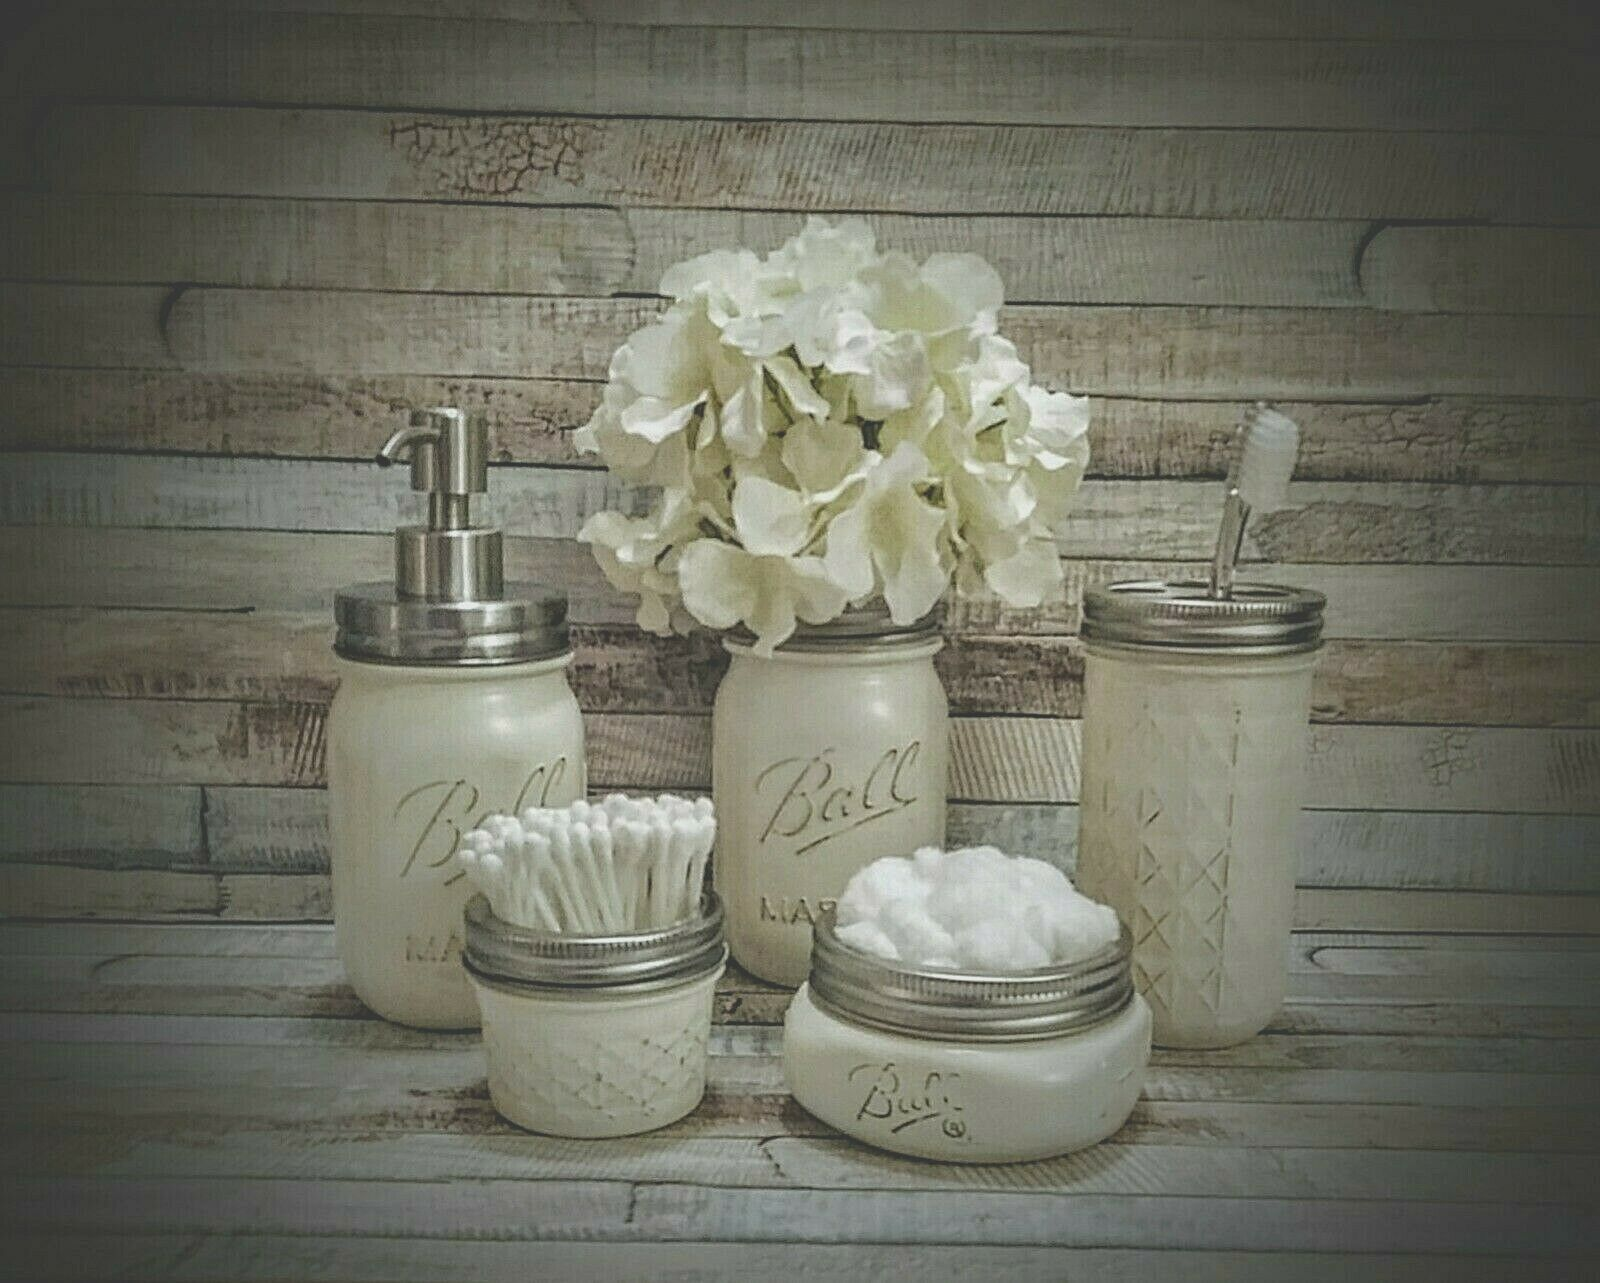 5 PIECE RUSTIC MASON JAR BATHROOM SET